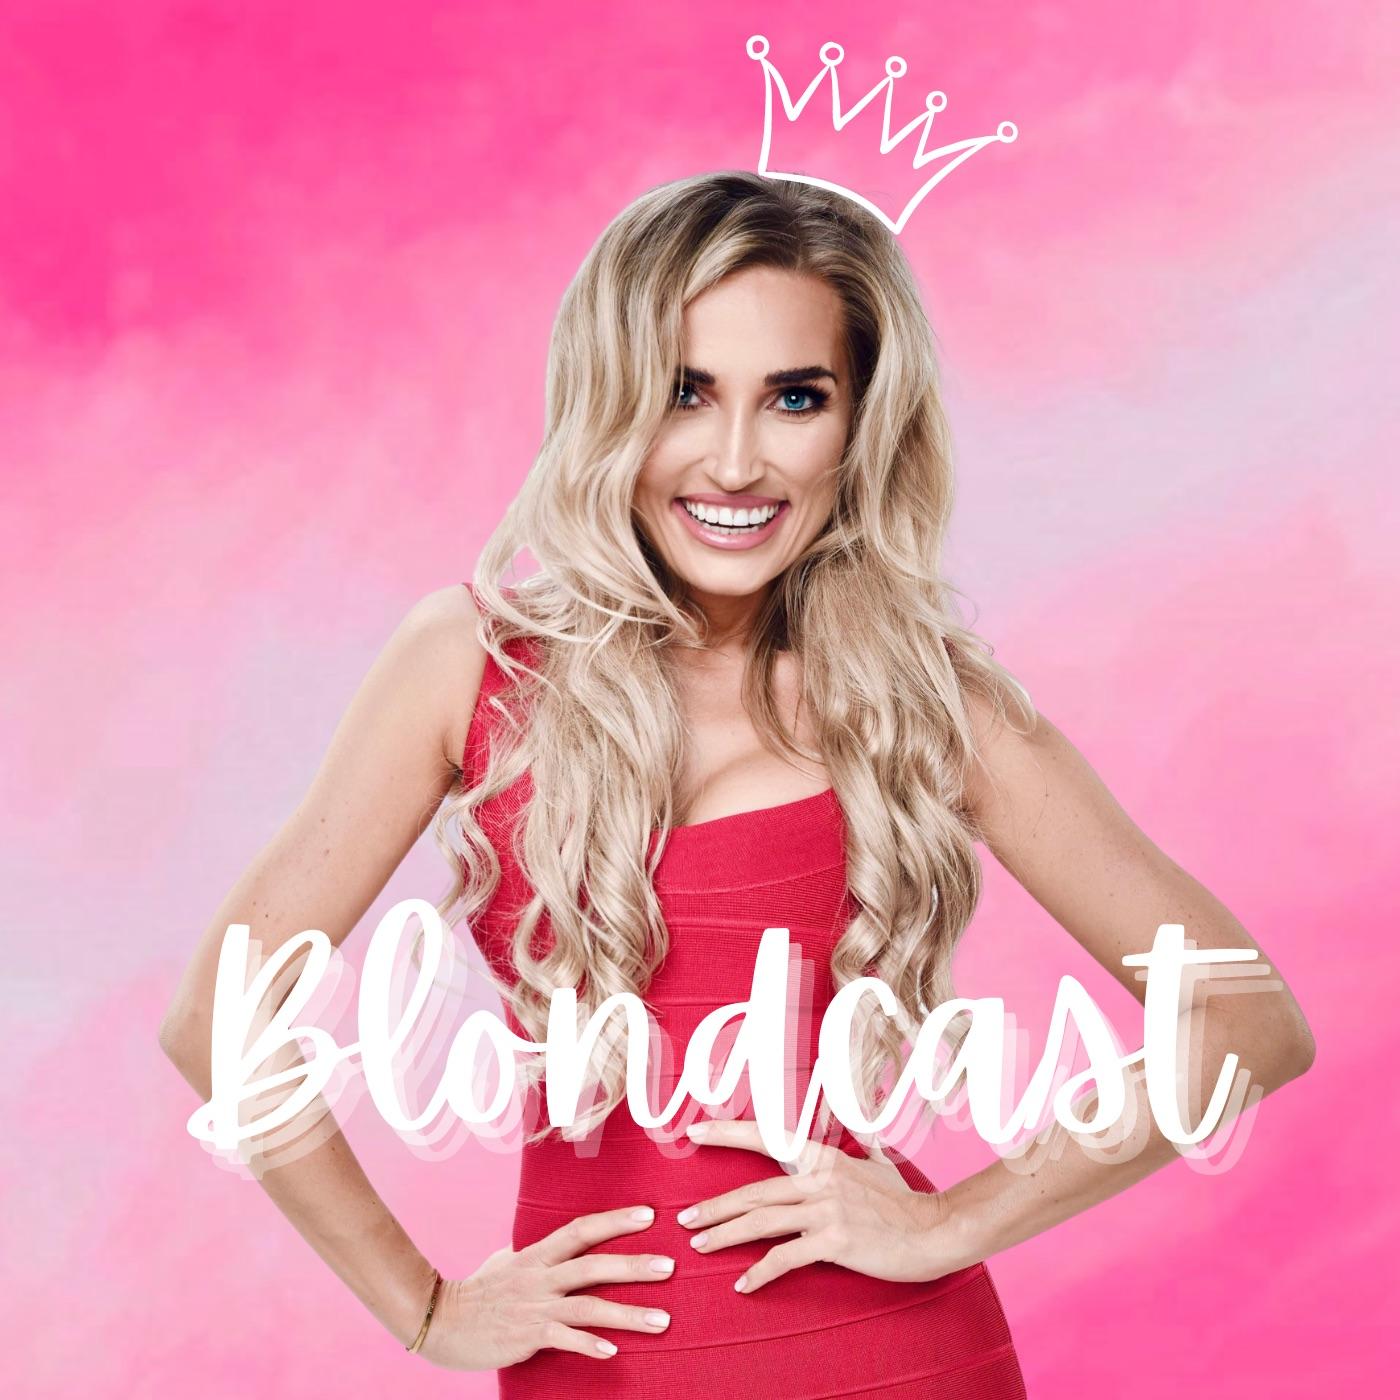 Blondcast